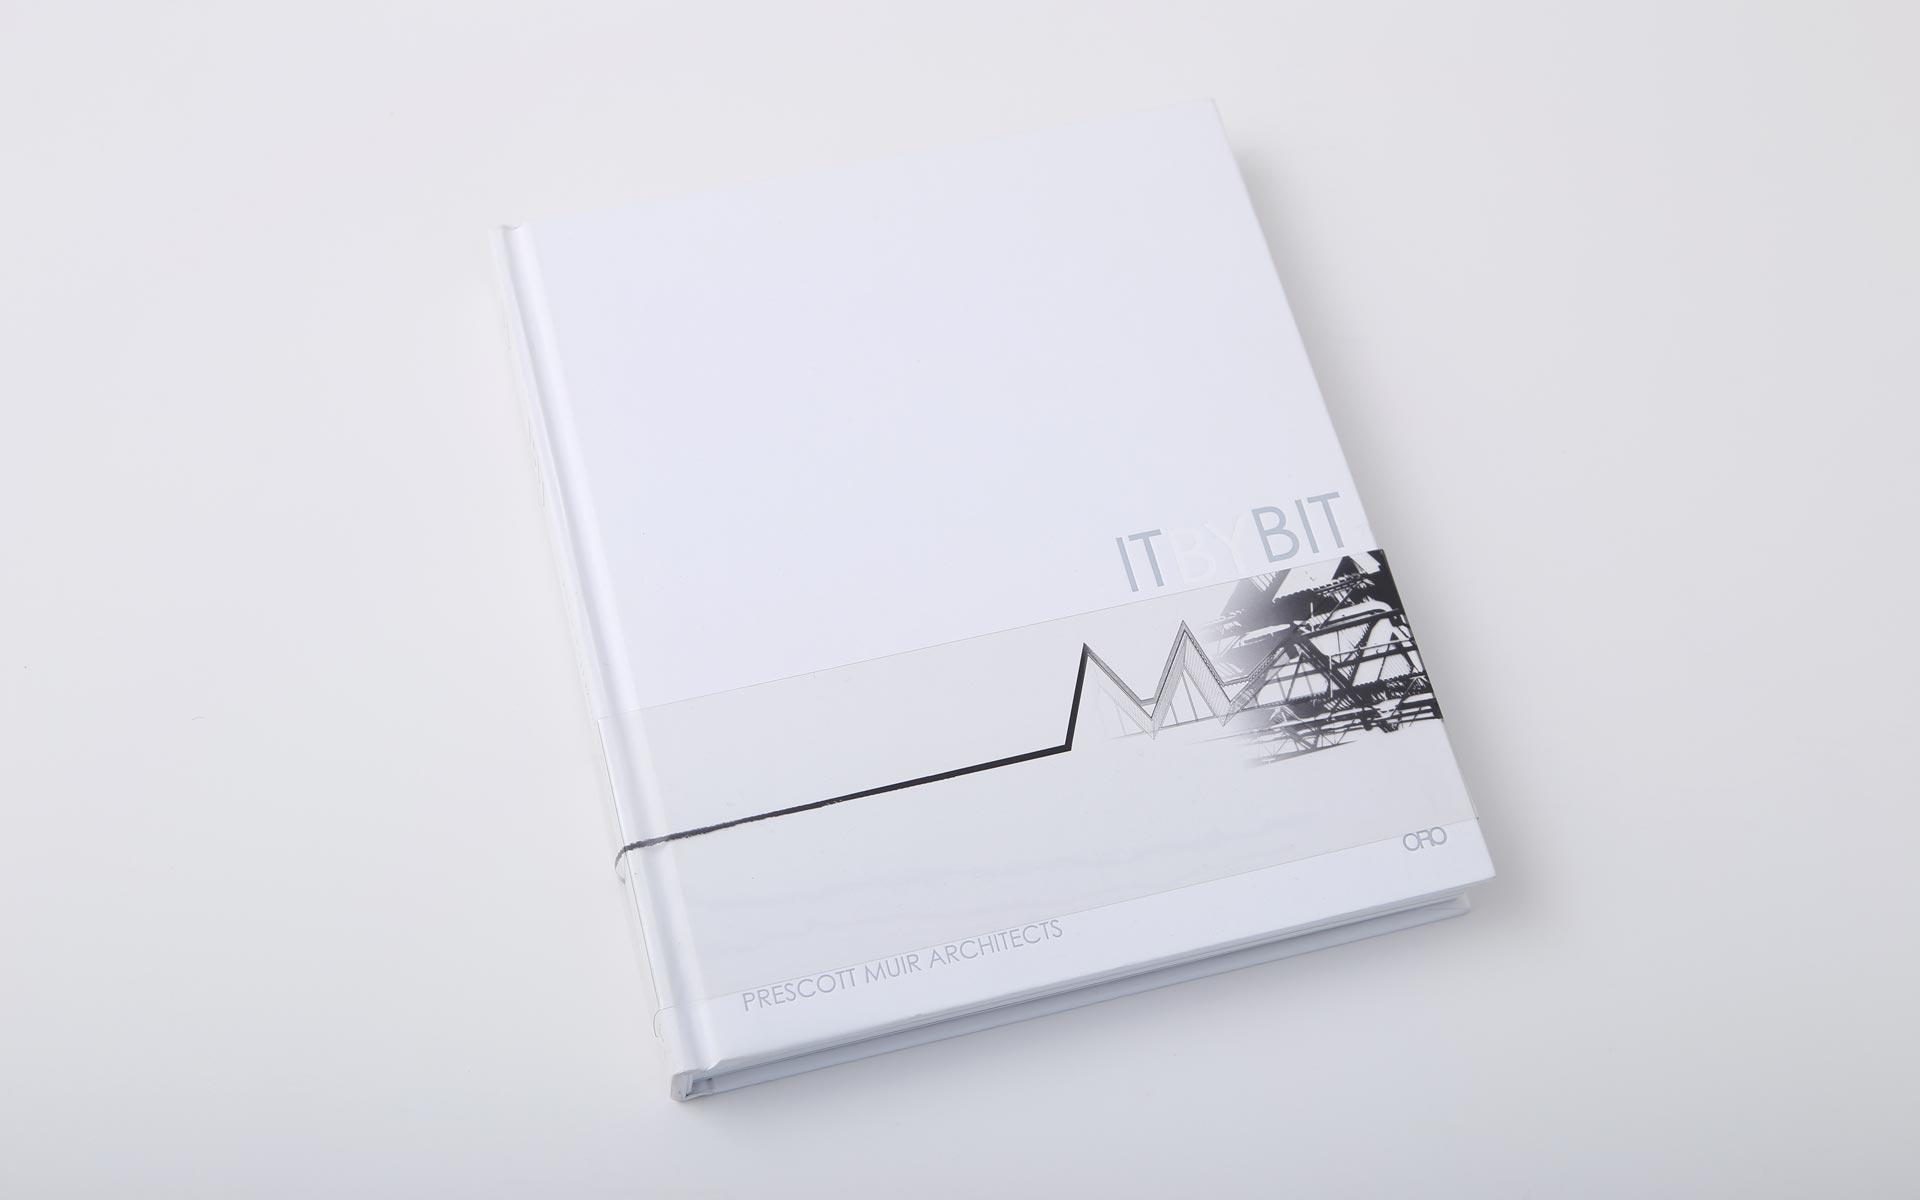 prescott-muir-architecture-book-design-1